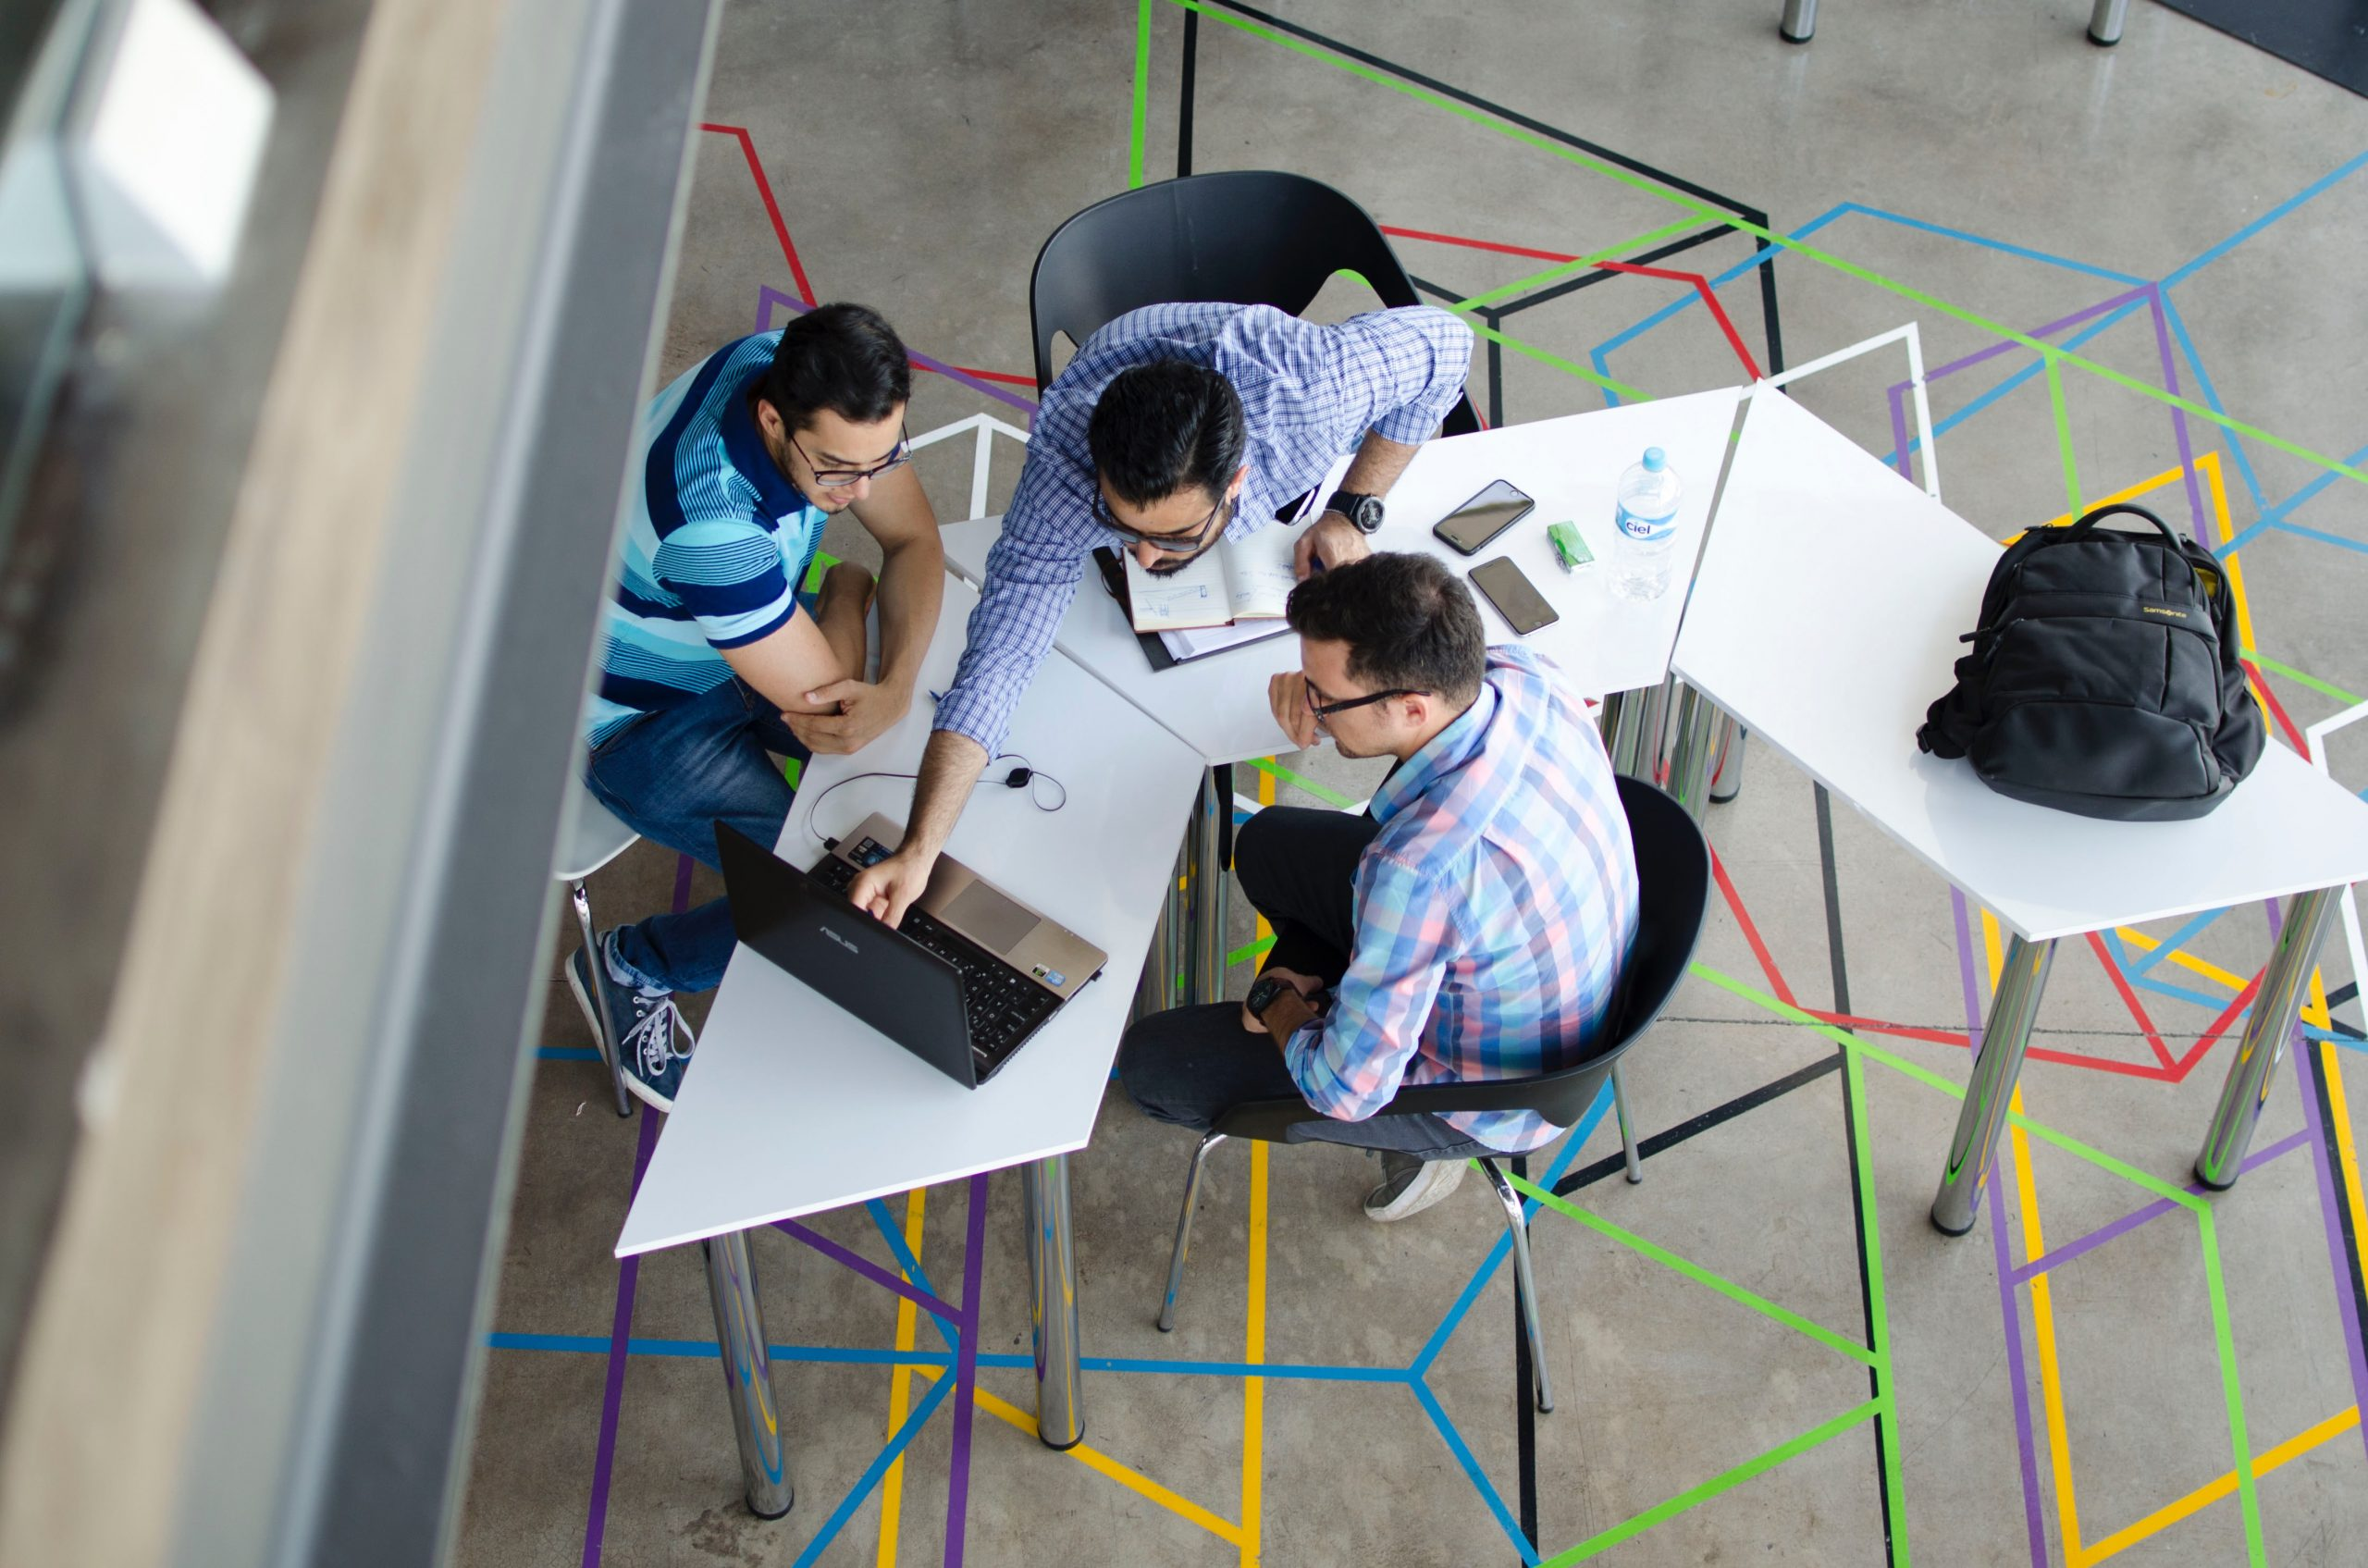 Networking, Profitabel, gewinnbringend, finanzieller Erfolg